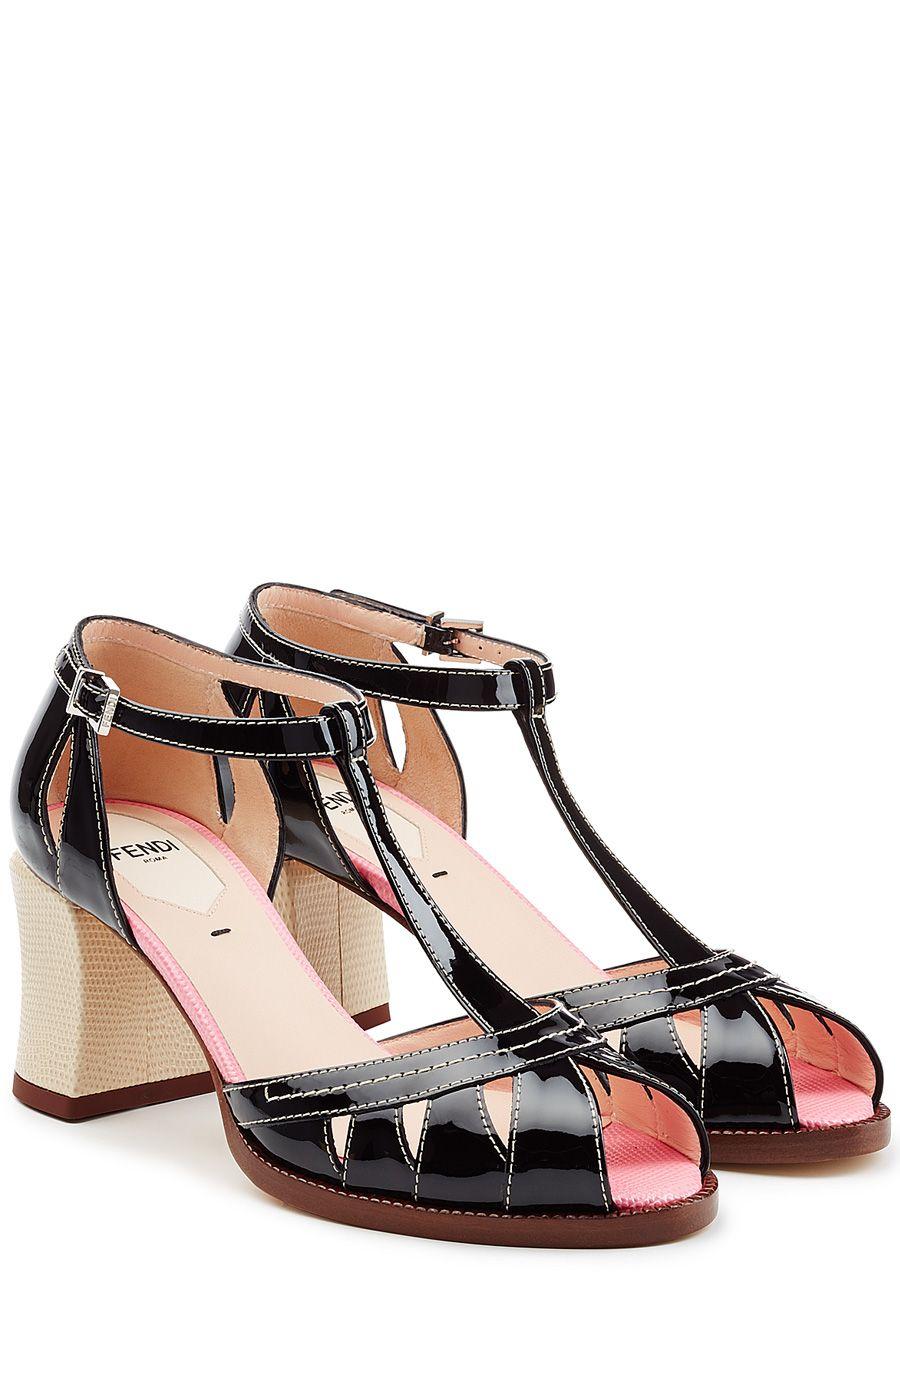 Patent Leather Block Heel Sandals detail 0